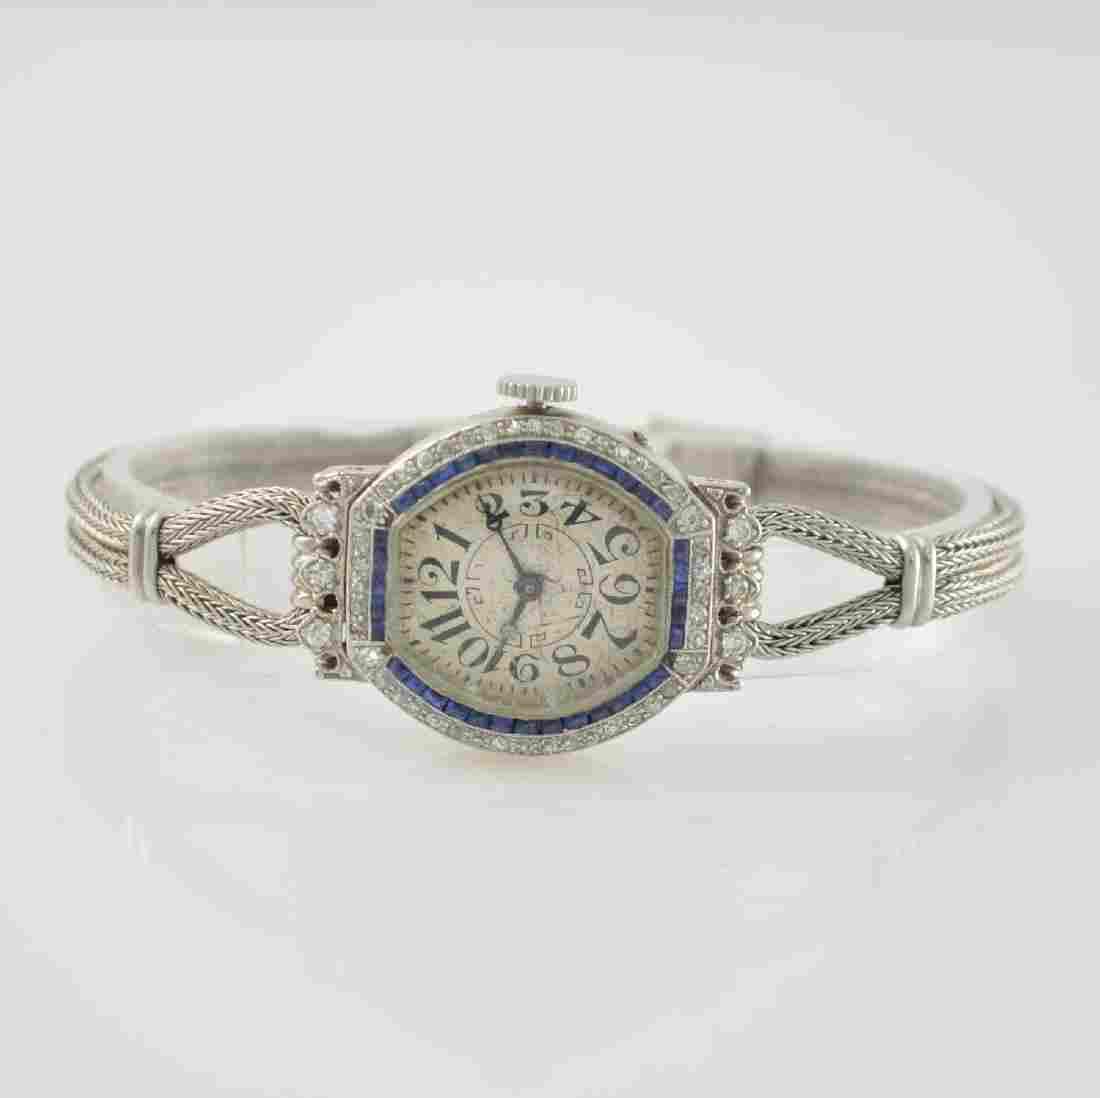 WALTHAM platinum ladies wristwatch, USA around 1912